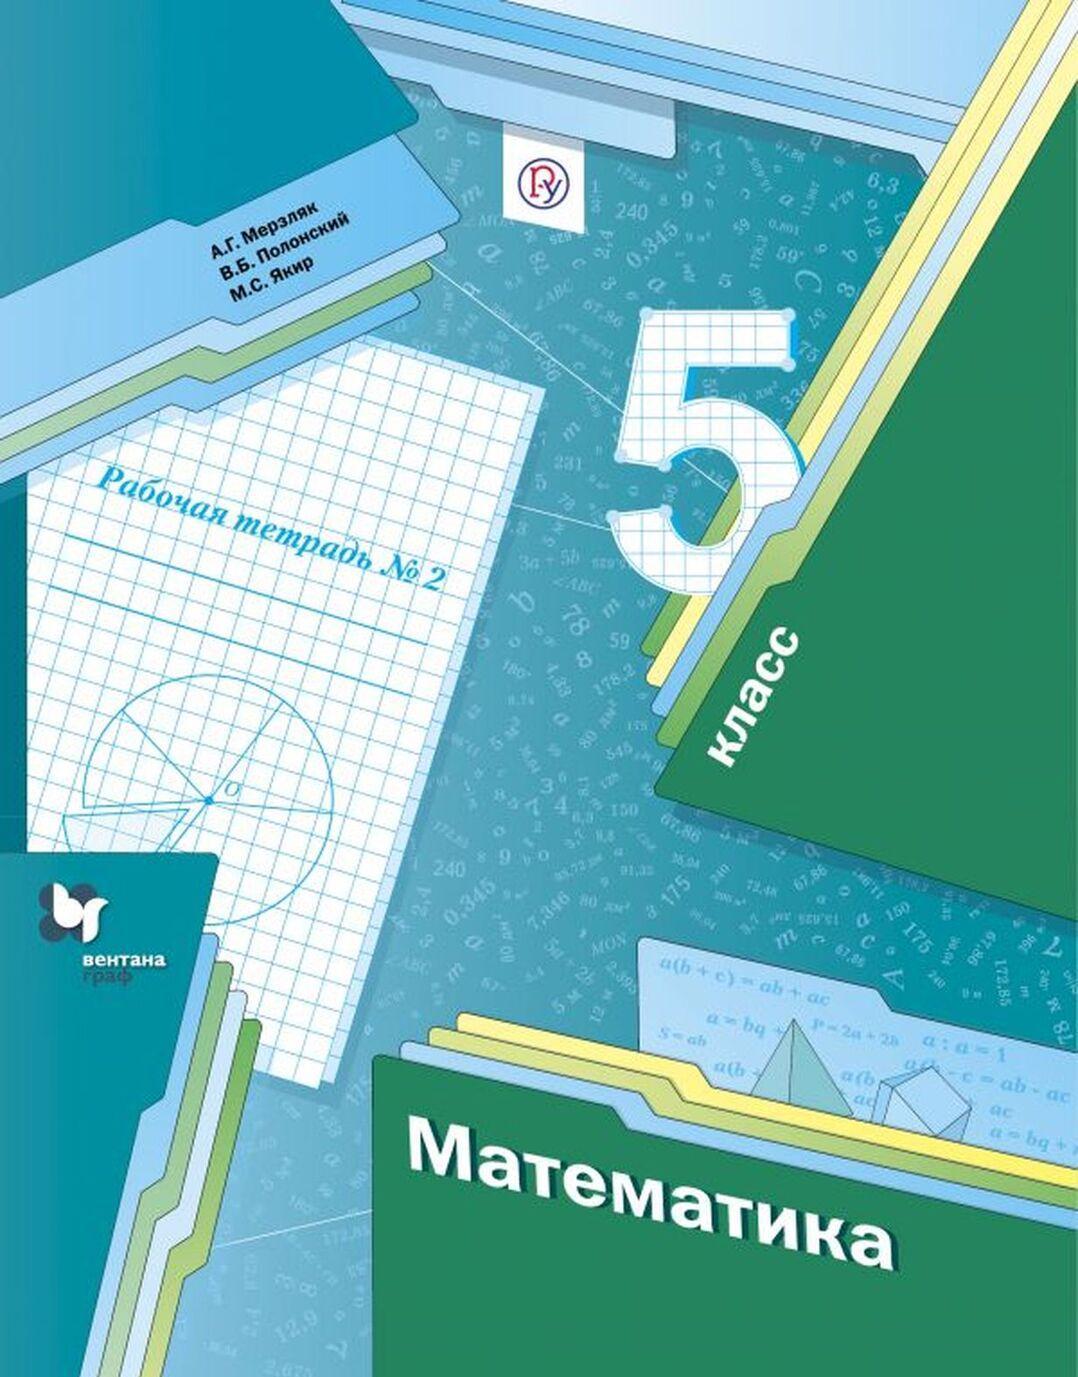 Matematika. 5klass. Rabochaja tetrad. V 2-kh chastjakh. Chast 2 | Merzljak Arkadij Grigorevich, Jakir Mikhail Semenovich